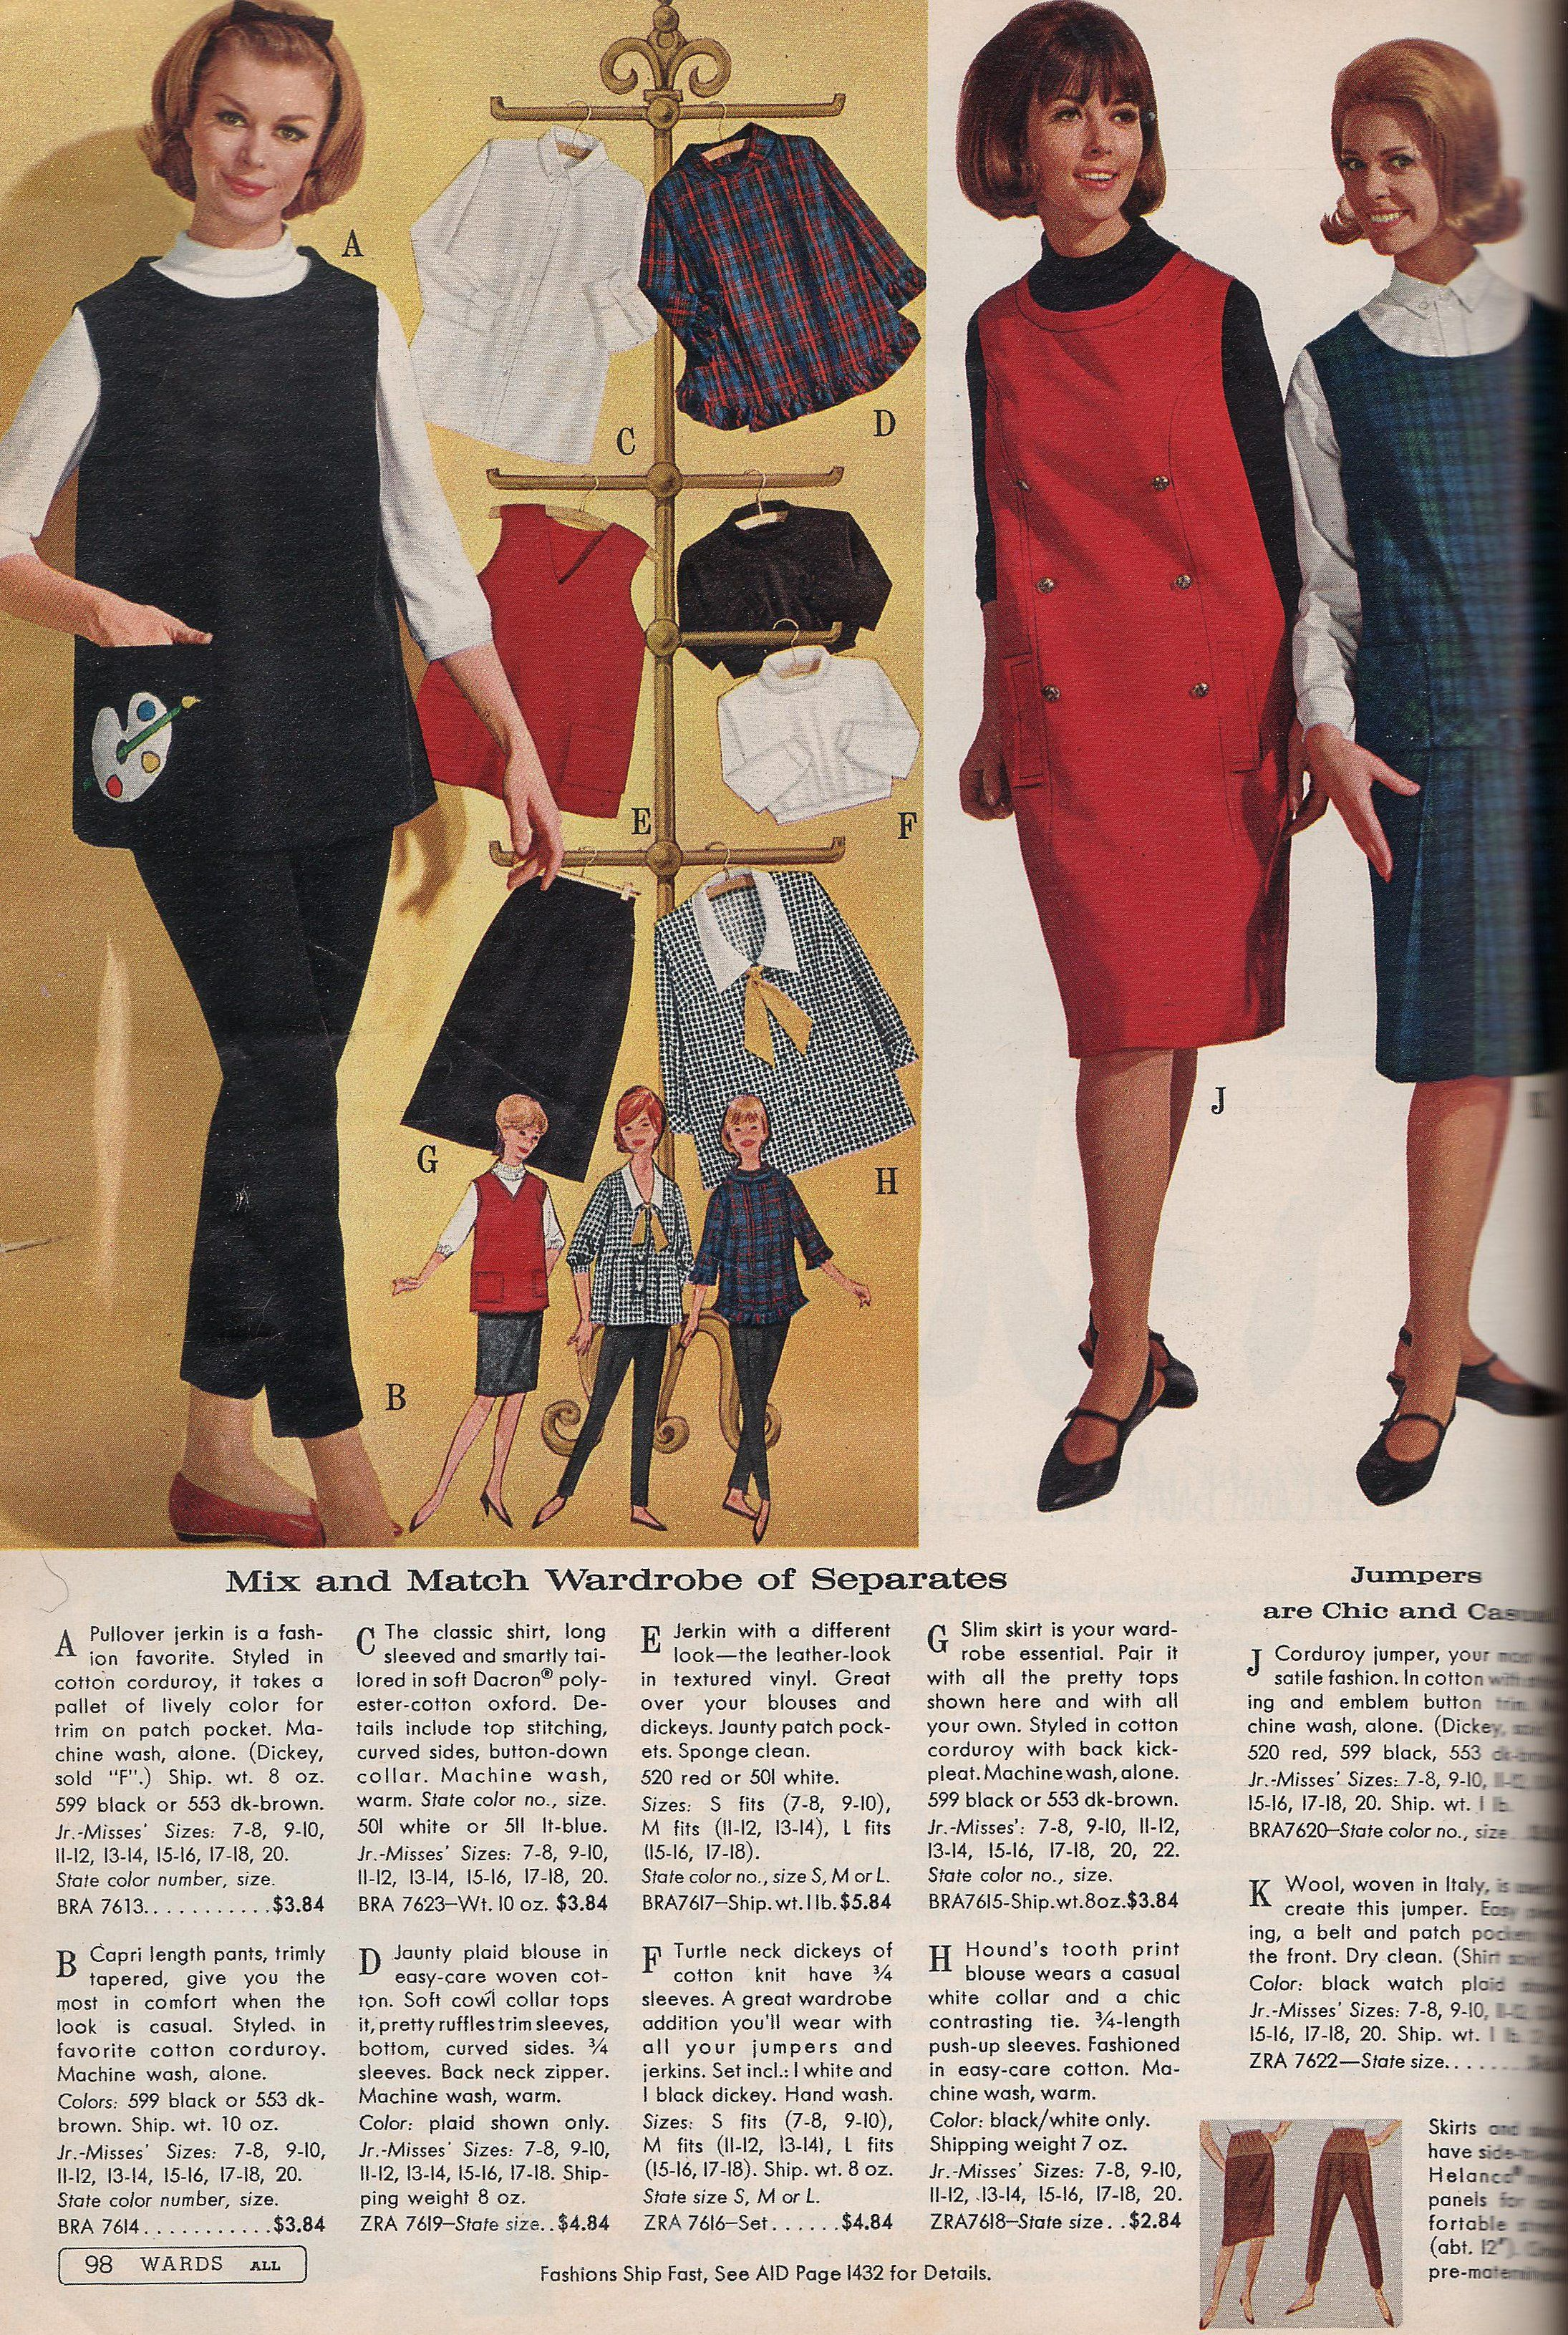 Fashion mail order catalogs 9